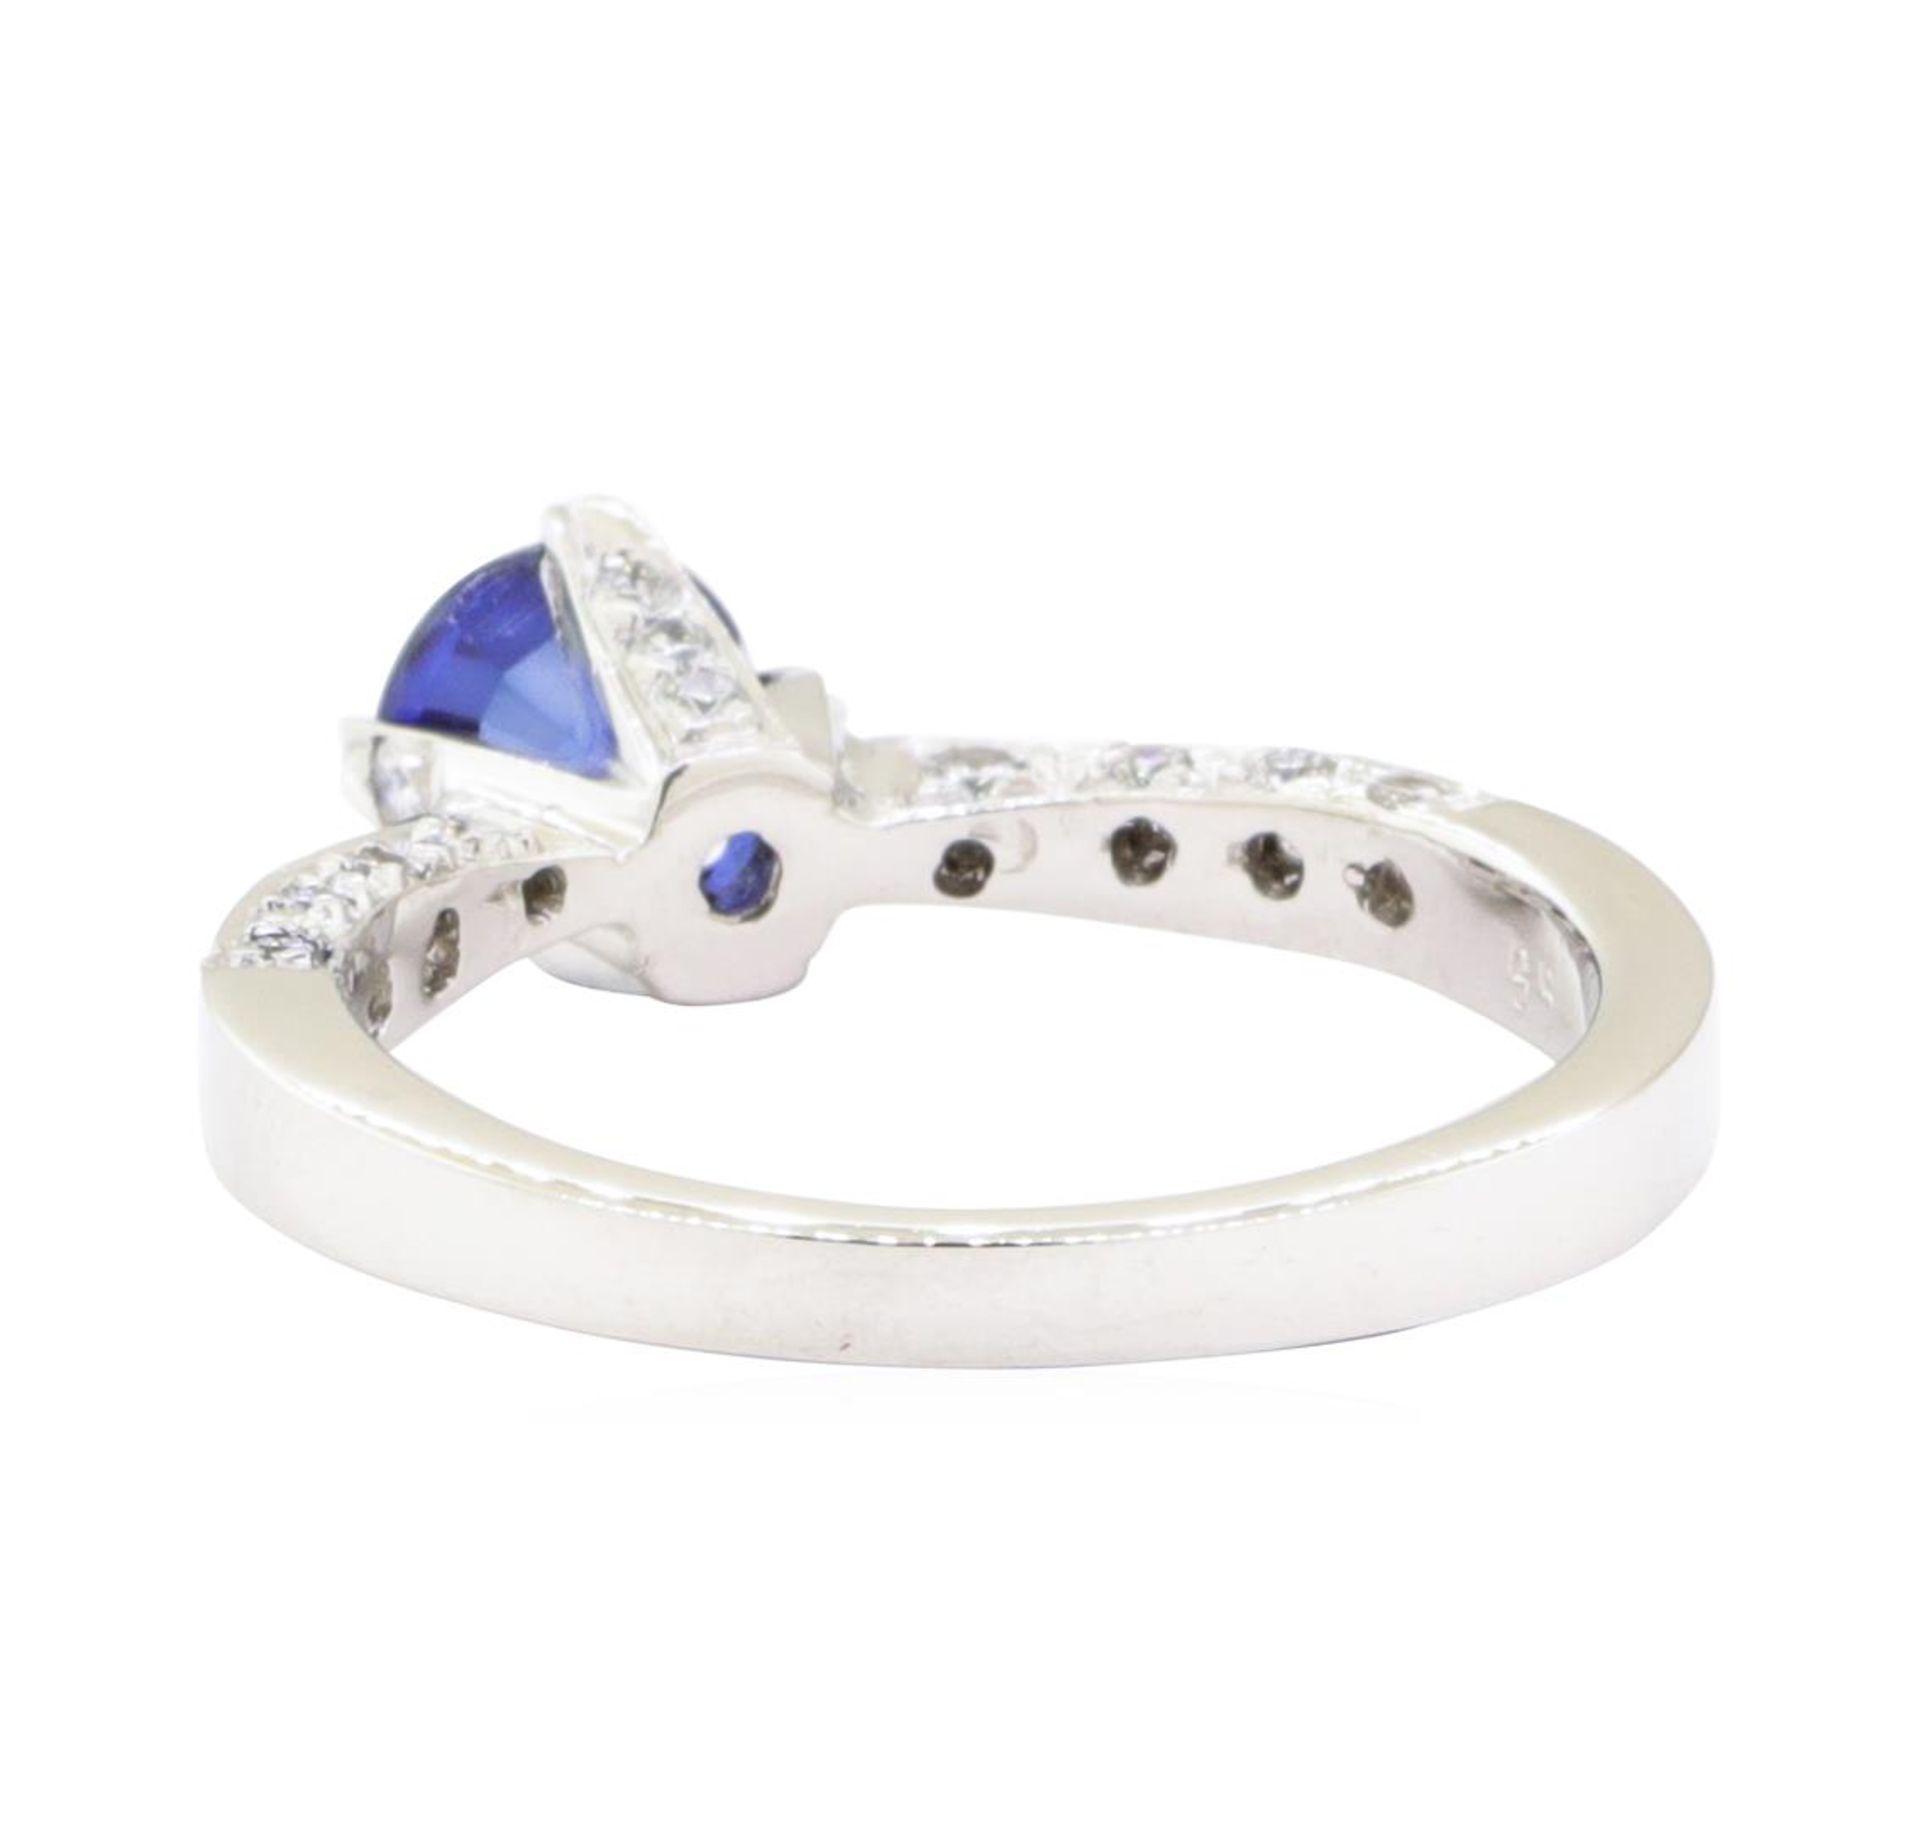 1.69 ctw Sapphire And Diamond Ring - Platinum - Image 3 of 5